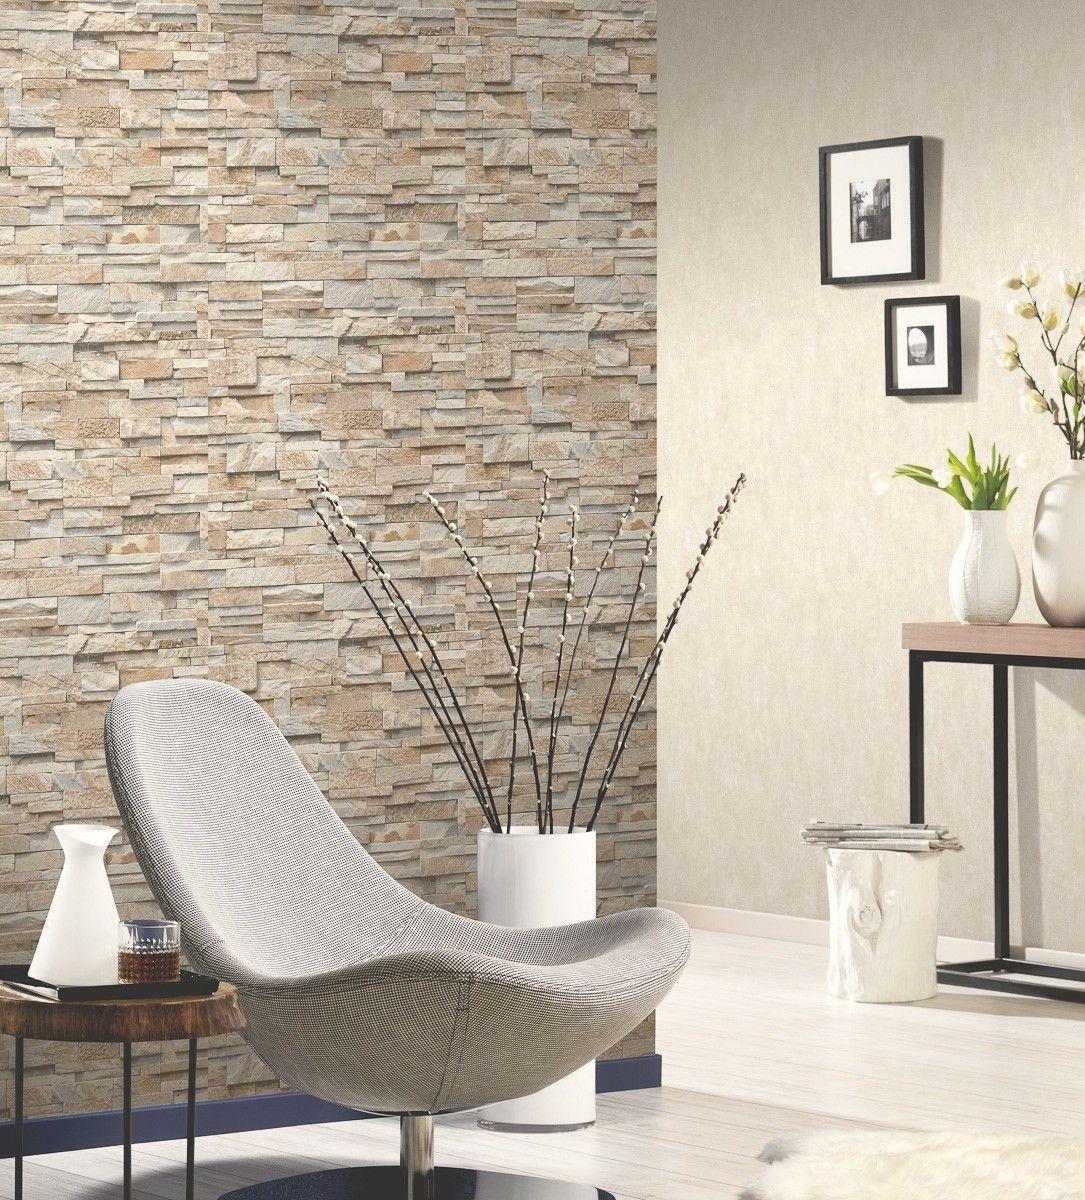 Vliestapete Stein 3d Optik Beige Grau Mauer 02363 10 3dwallpaperinterior Beige Grau Mau In 2020 Stone Wall Design Brick Effect Wallpaper Stone Walls Interior